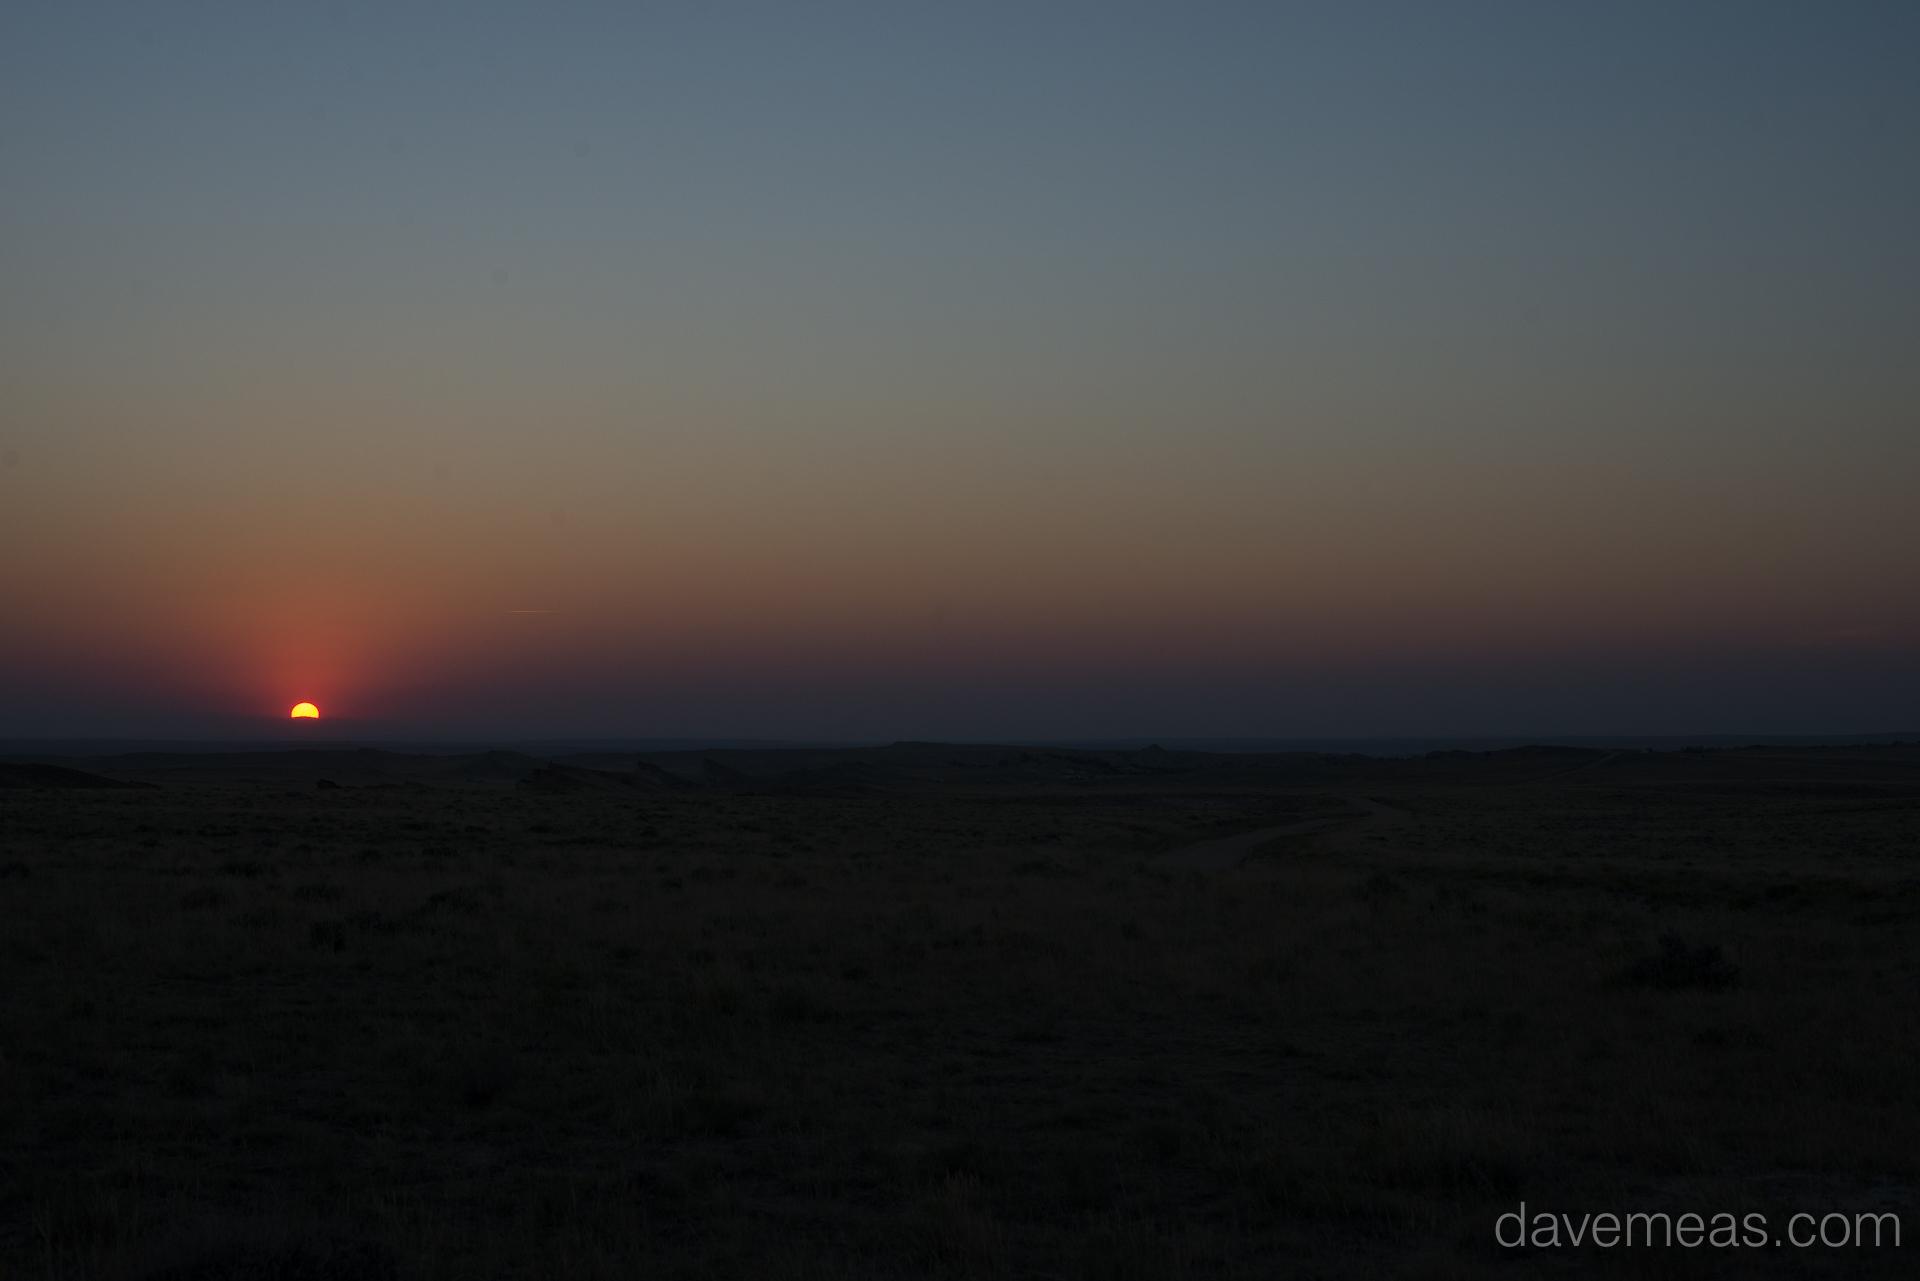 eclipse photos (20 of 20).jpg